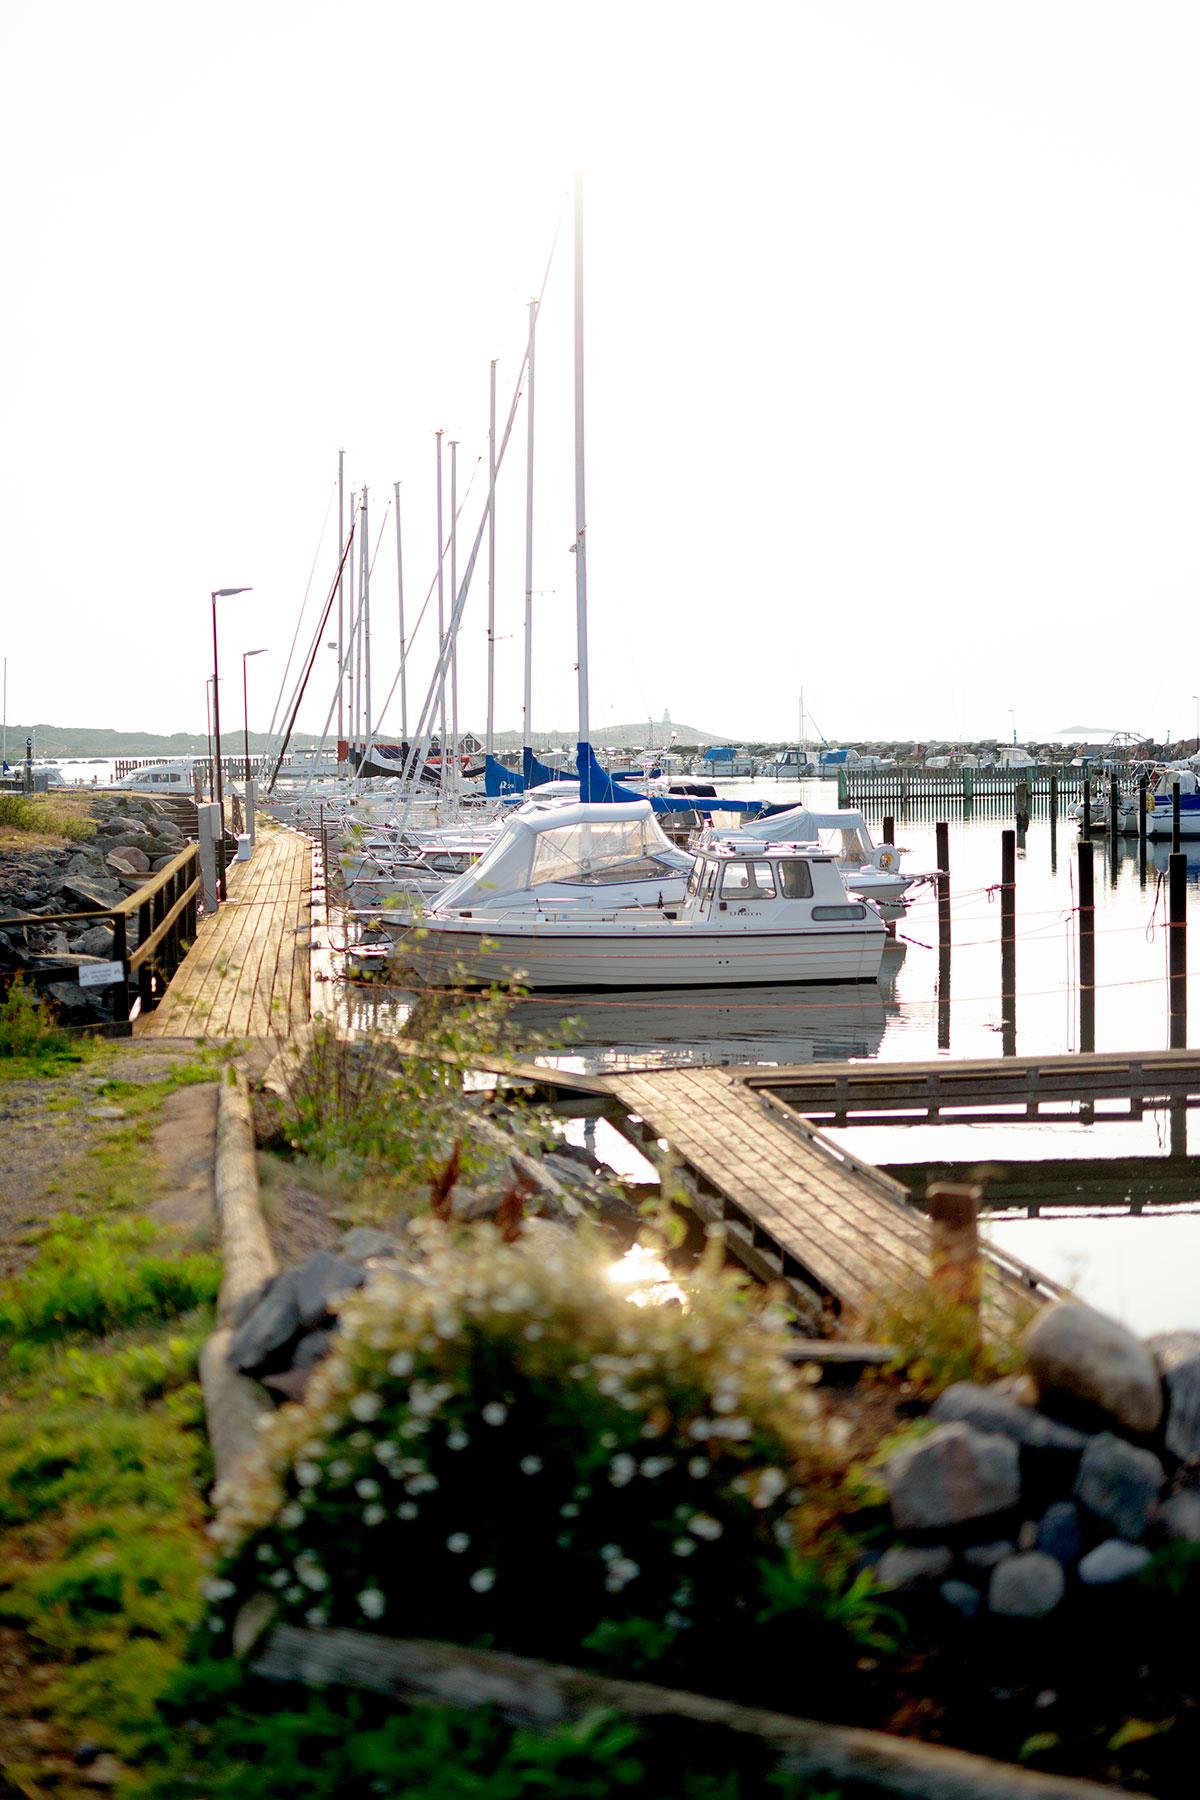 blogg-190829cyklahamnen7.jpg